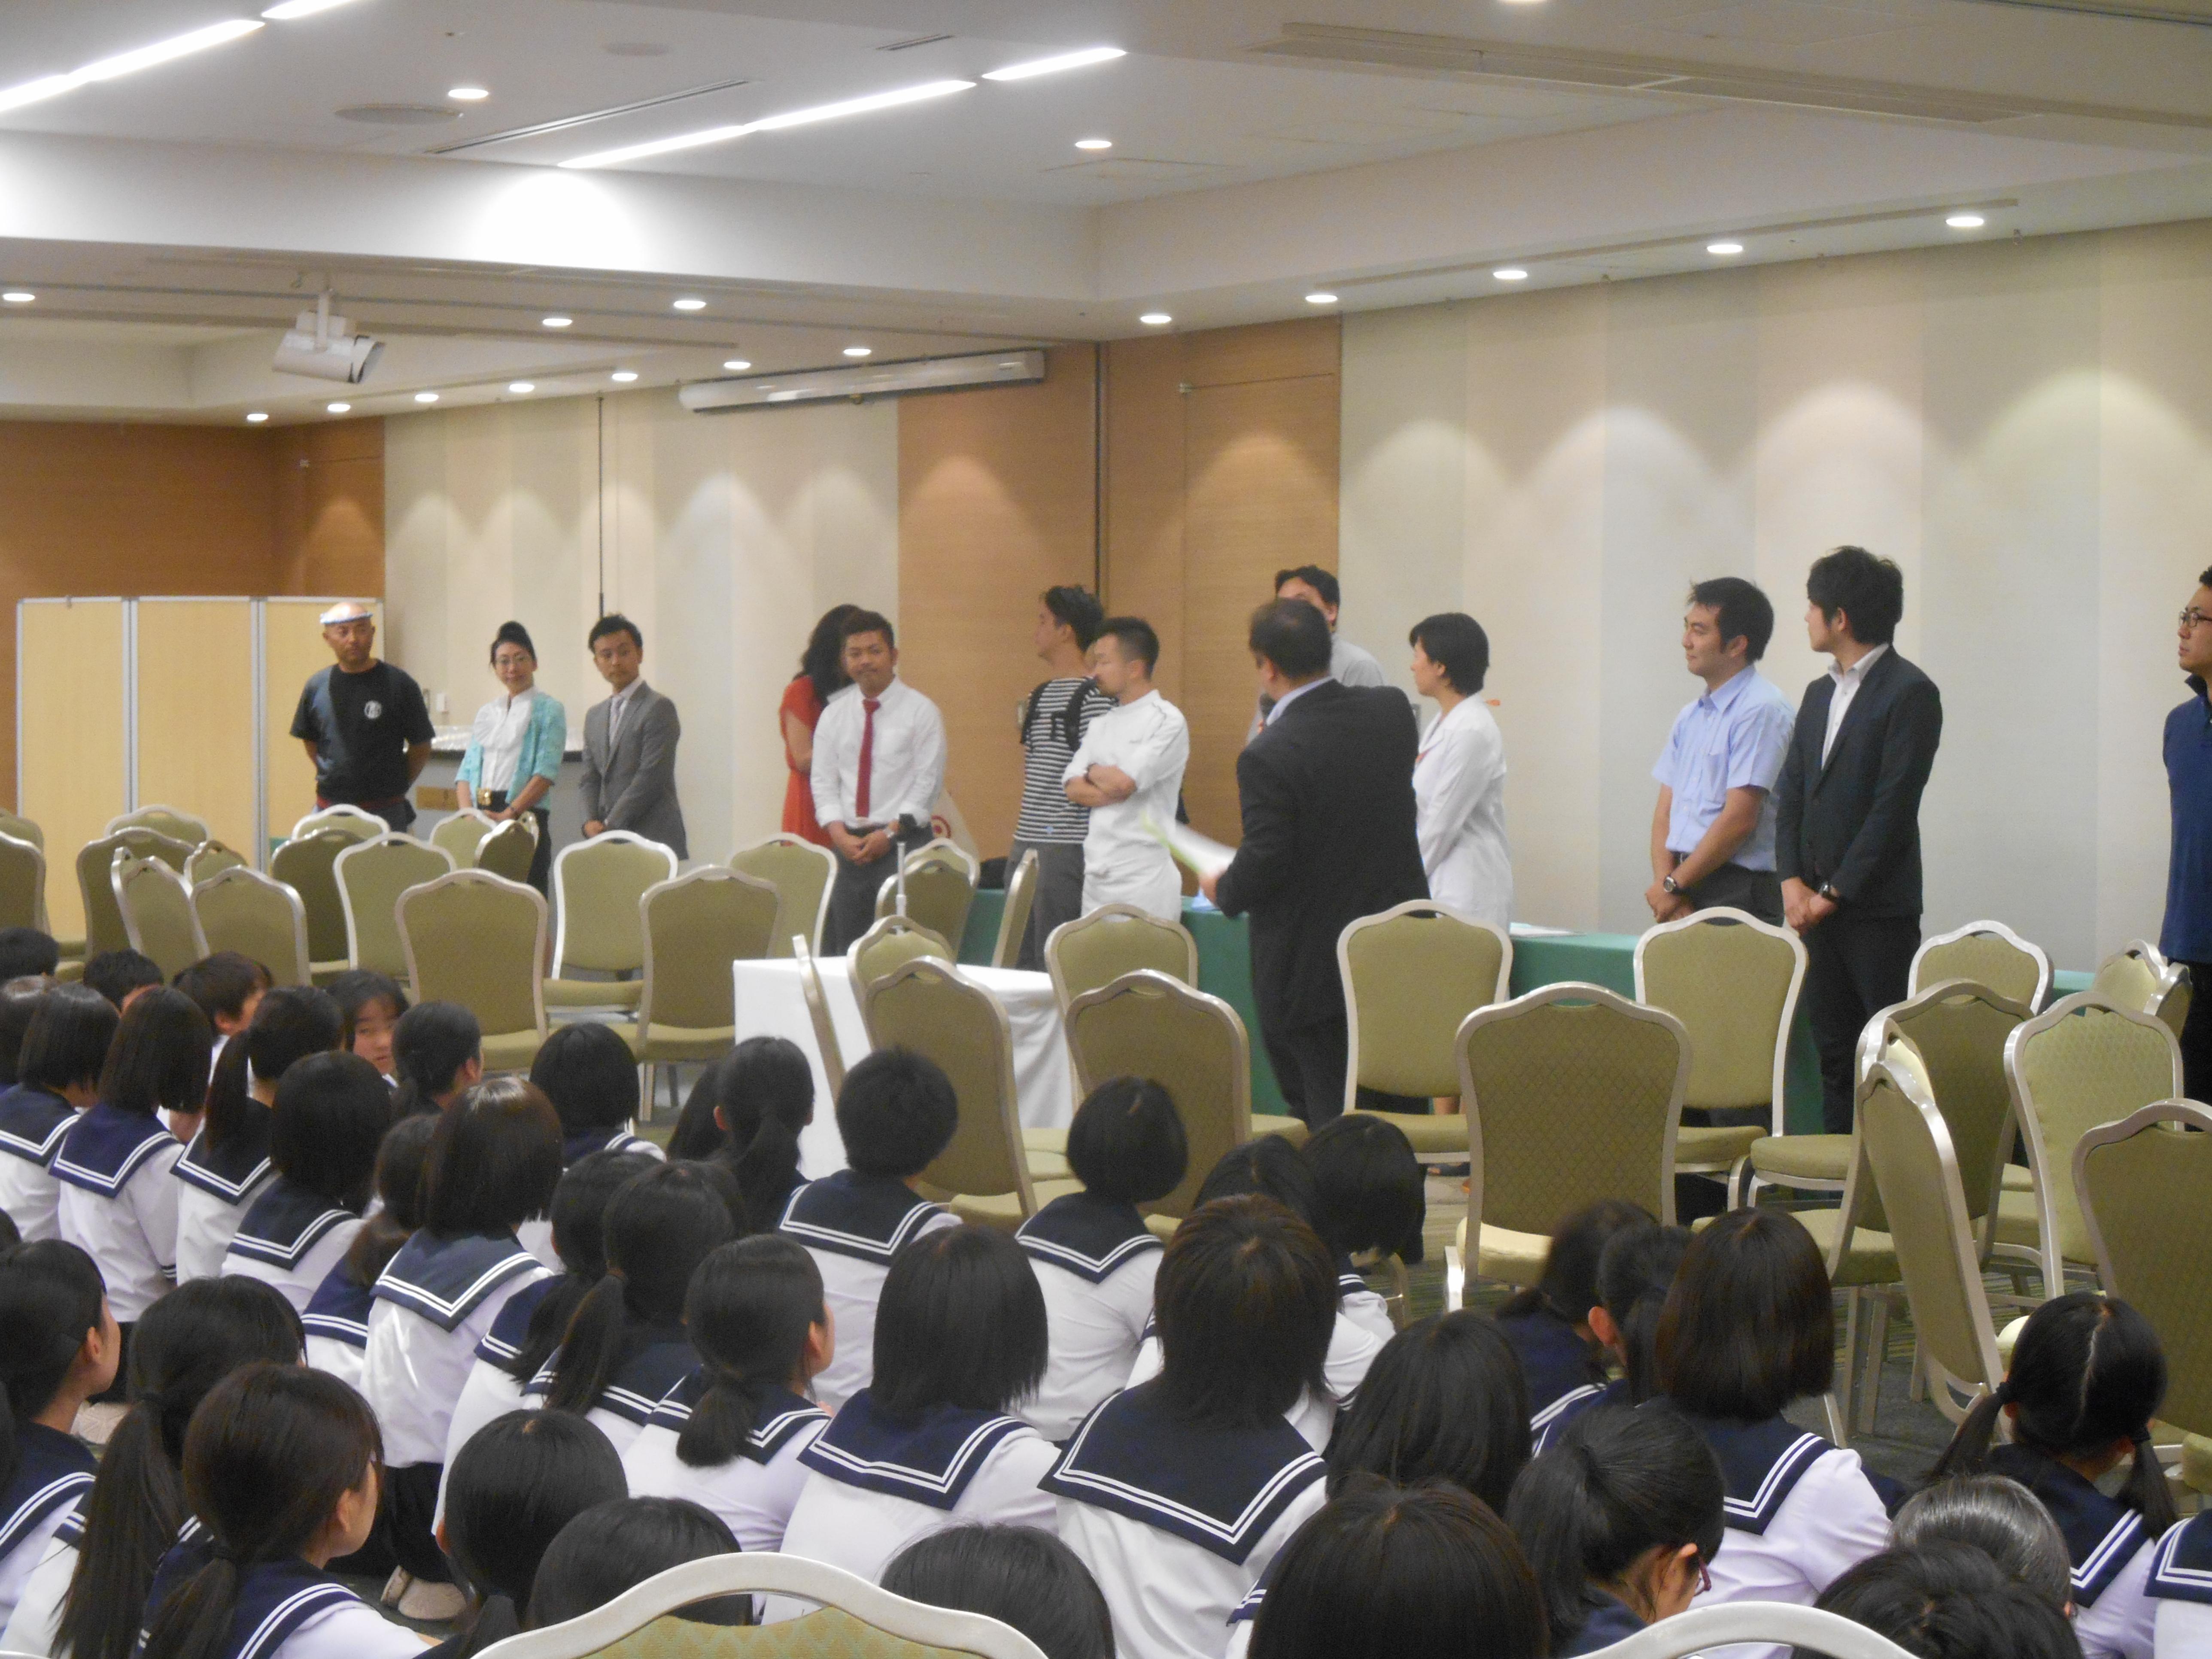 DSCN4369 - AOsuki主催:青森市内の中学校(修学旅行)に夢を与える時間